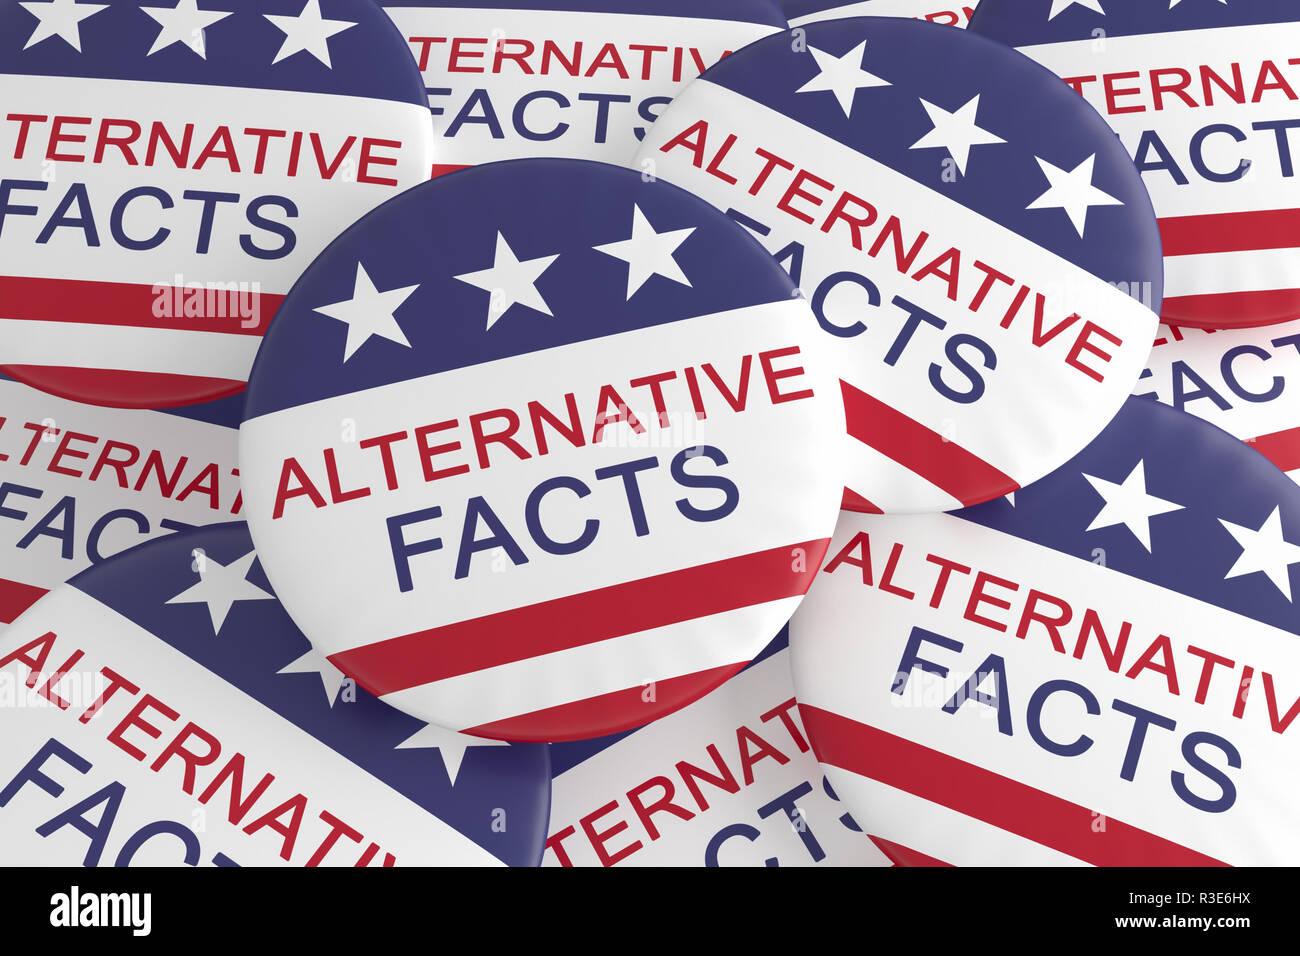 USA Politik Medien Aktuelles Konzept Abzeichen: Mit alternativen Fakten Button mit US-Flagge, 3D-Illustration Stapel Stockbild